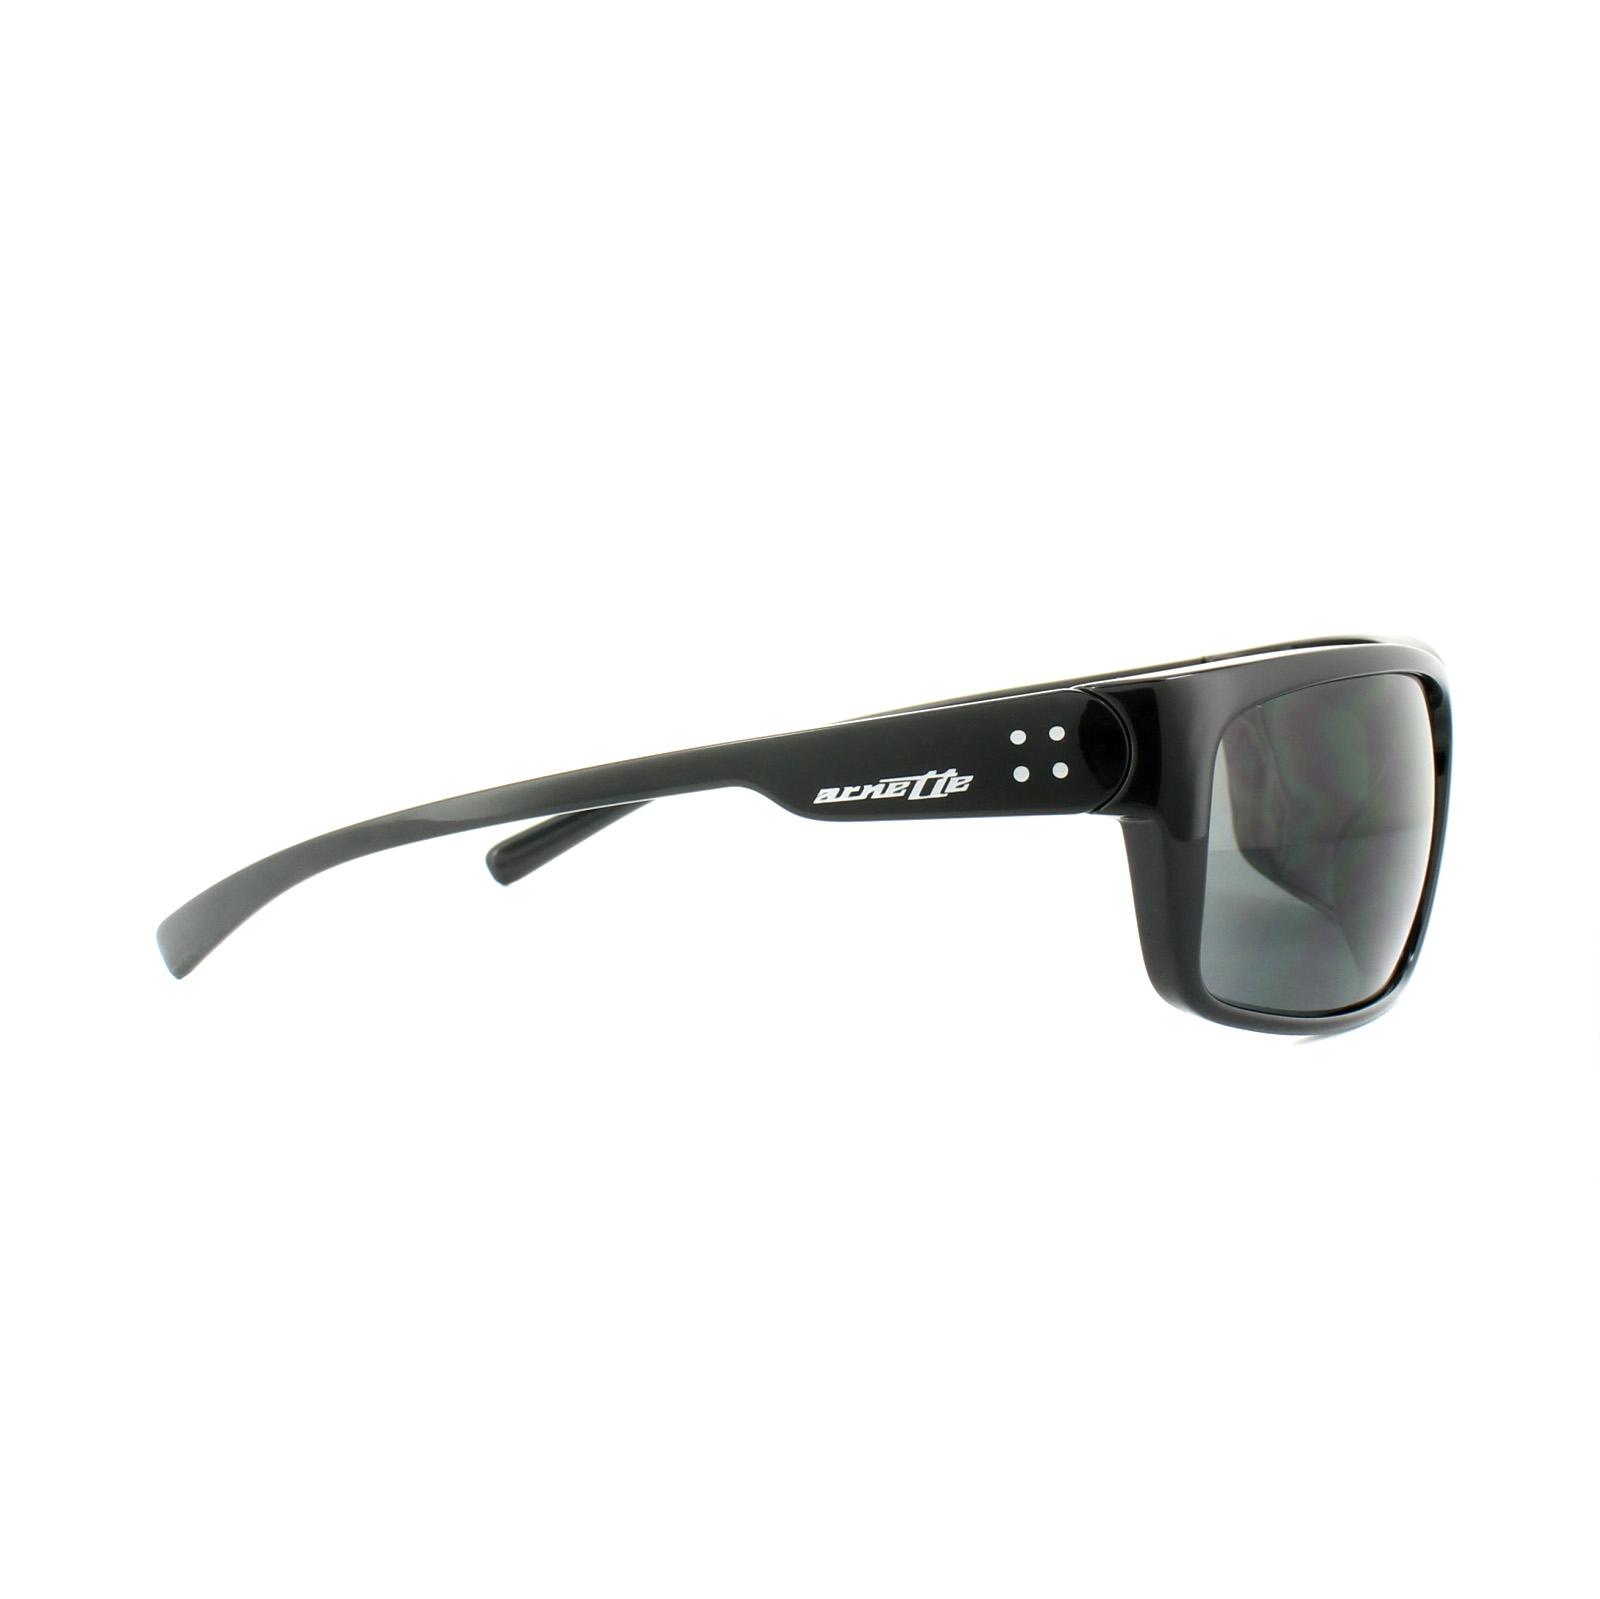 1a2716f519f Cheap Arnette Fastball 2.0 4242 Sunglasses - Discounted Sunglasses